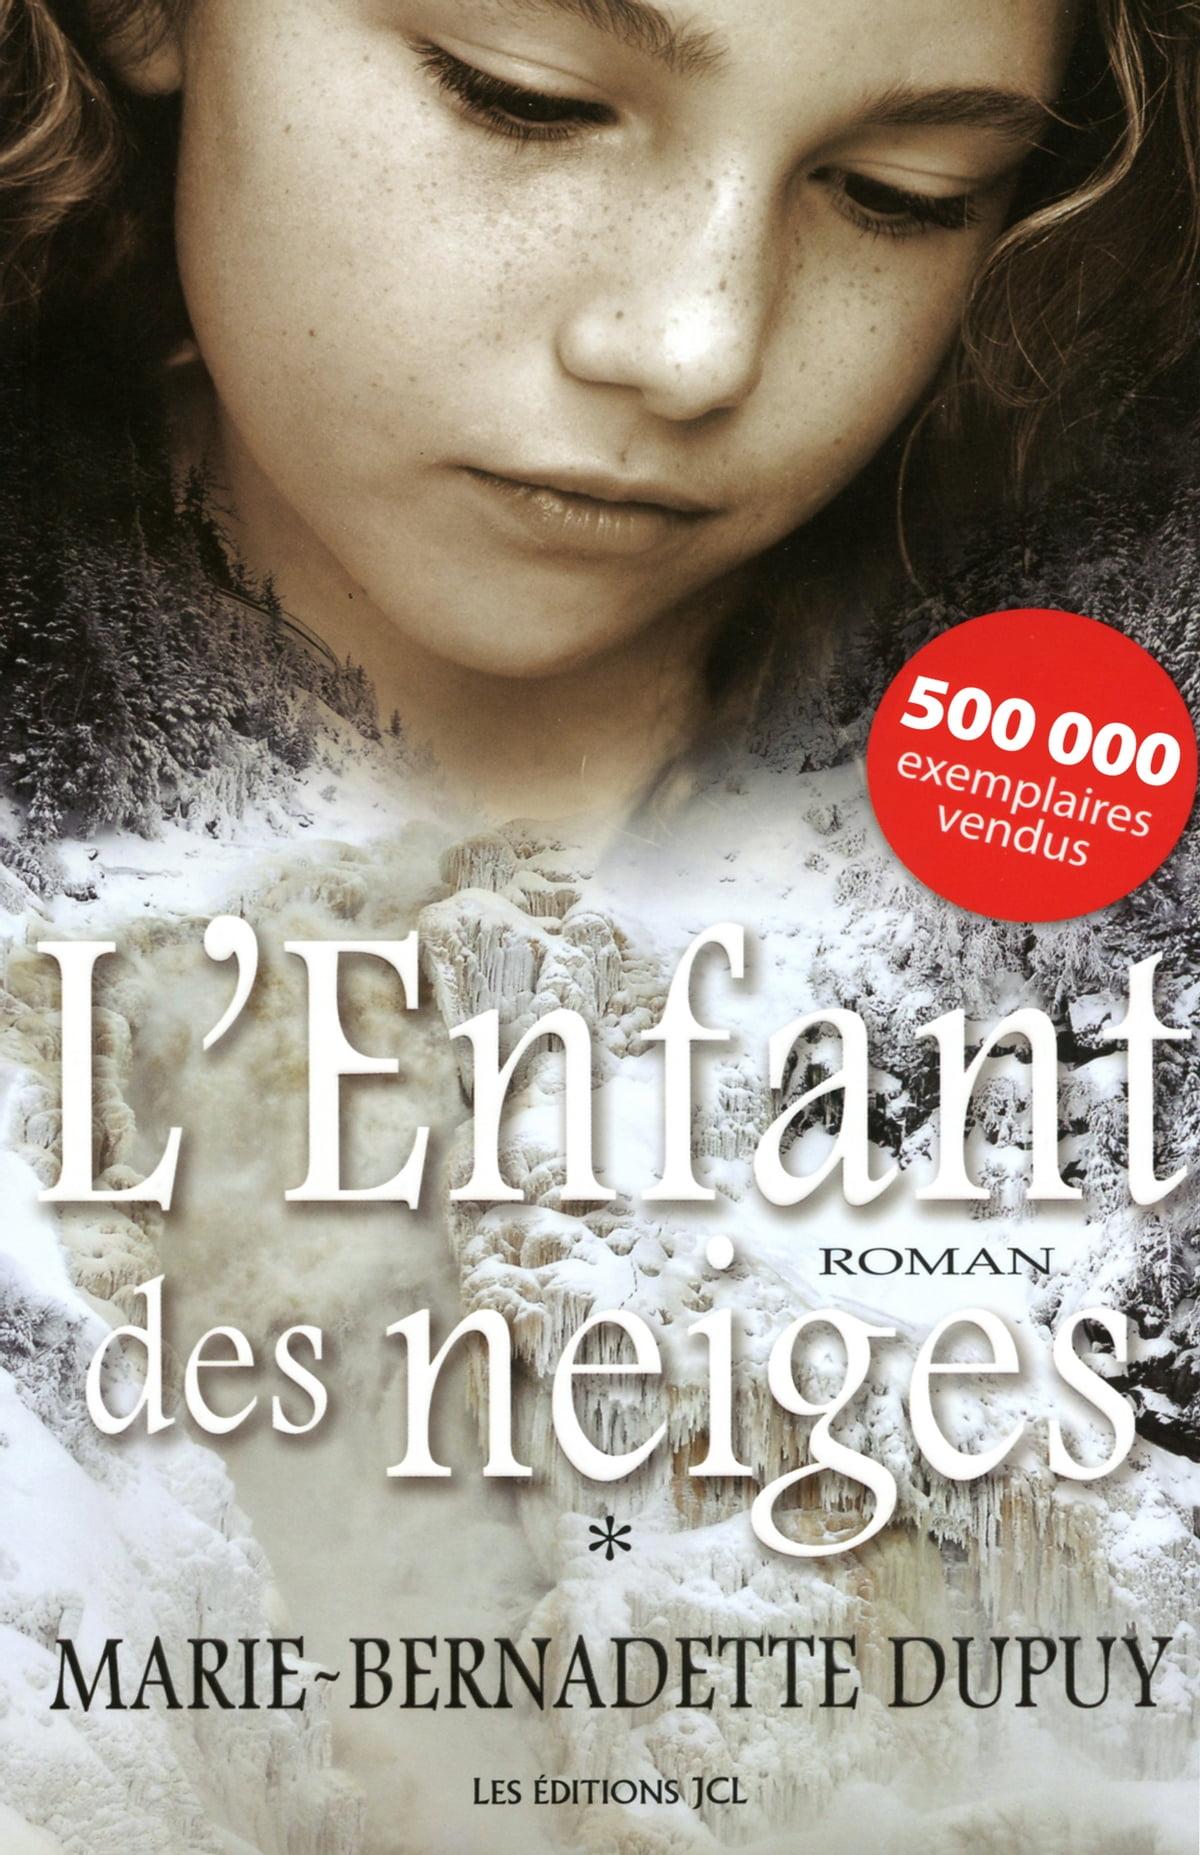 Marie-Bernadette Dupuy : biographie, bibliographie | fnac